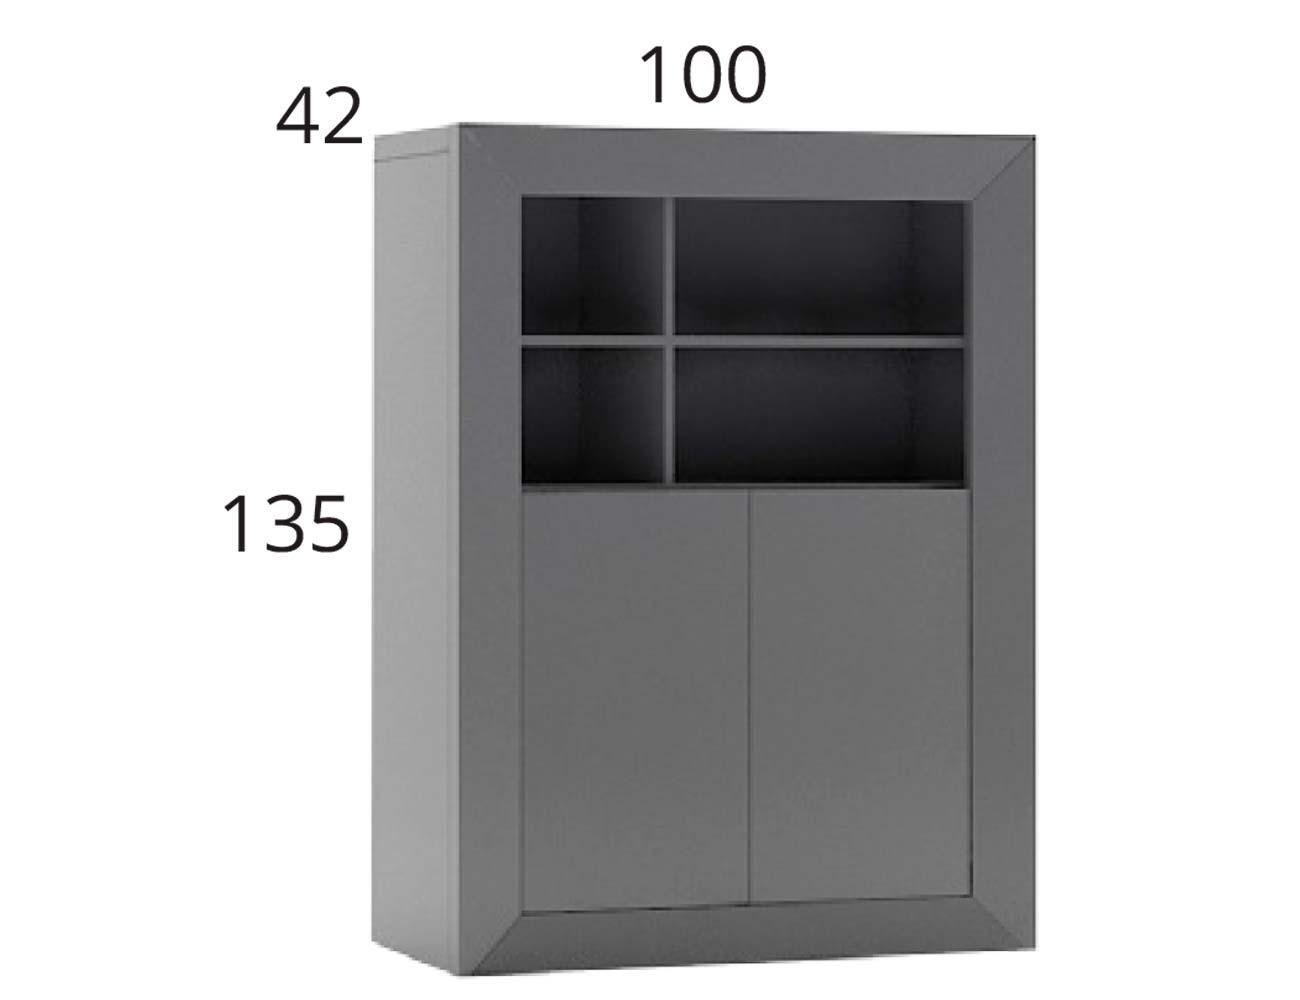 A0552